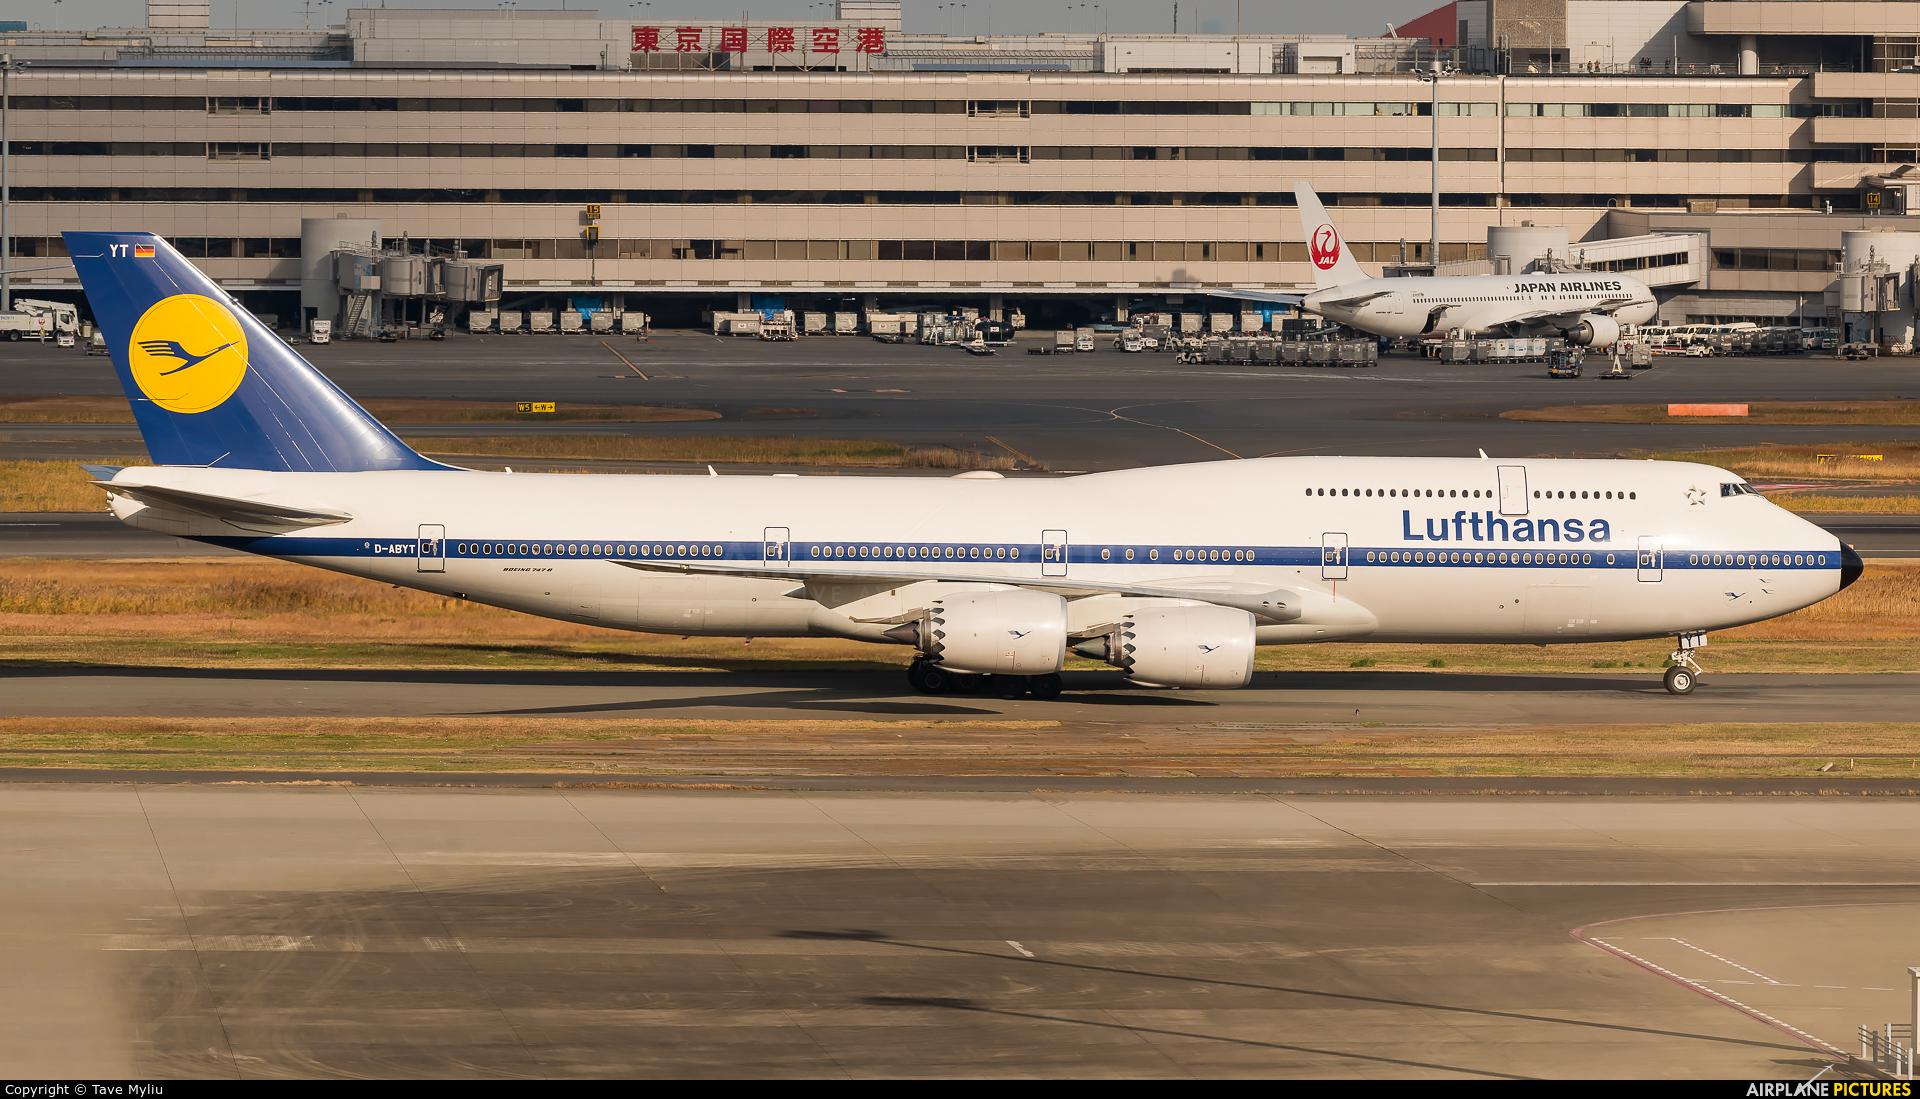 Lufthansa D-ABYT aircraft at Tokyo - Haneda Intl